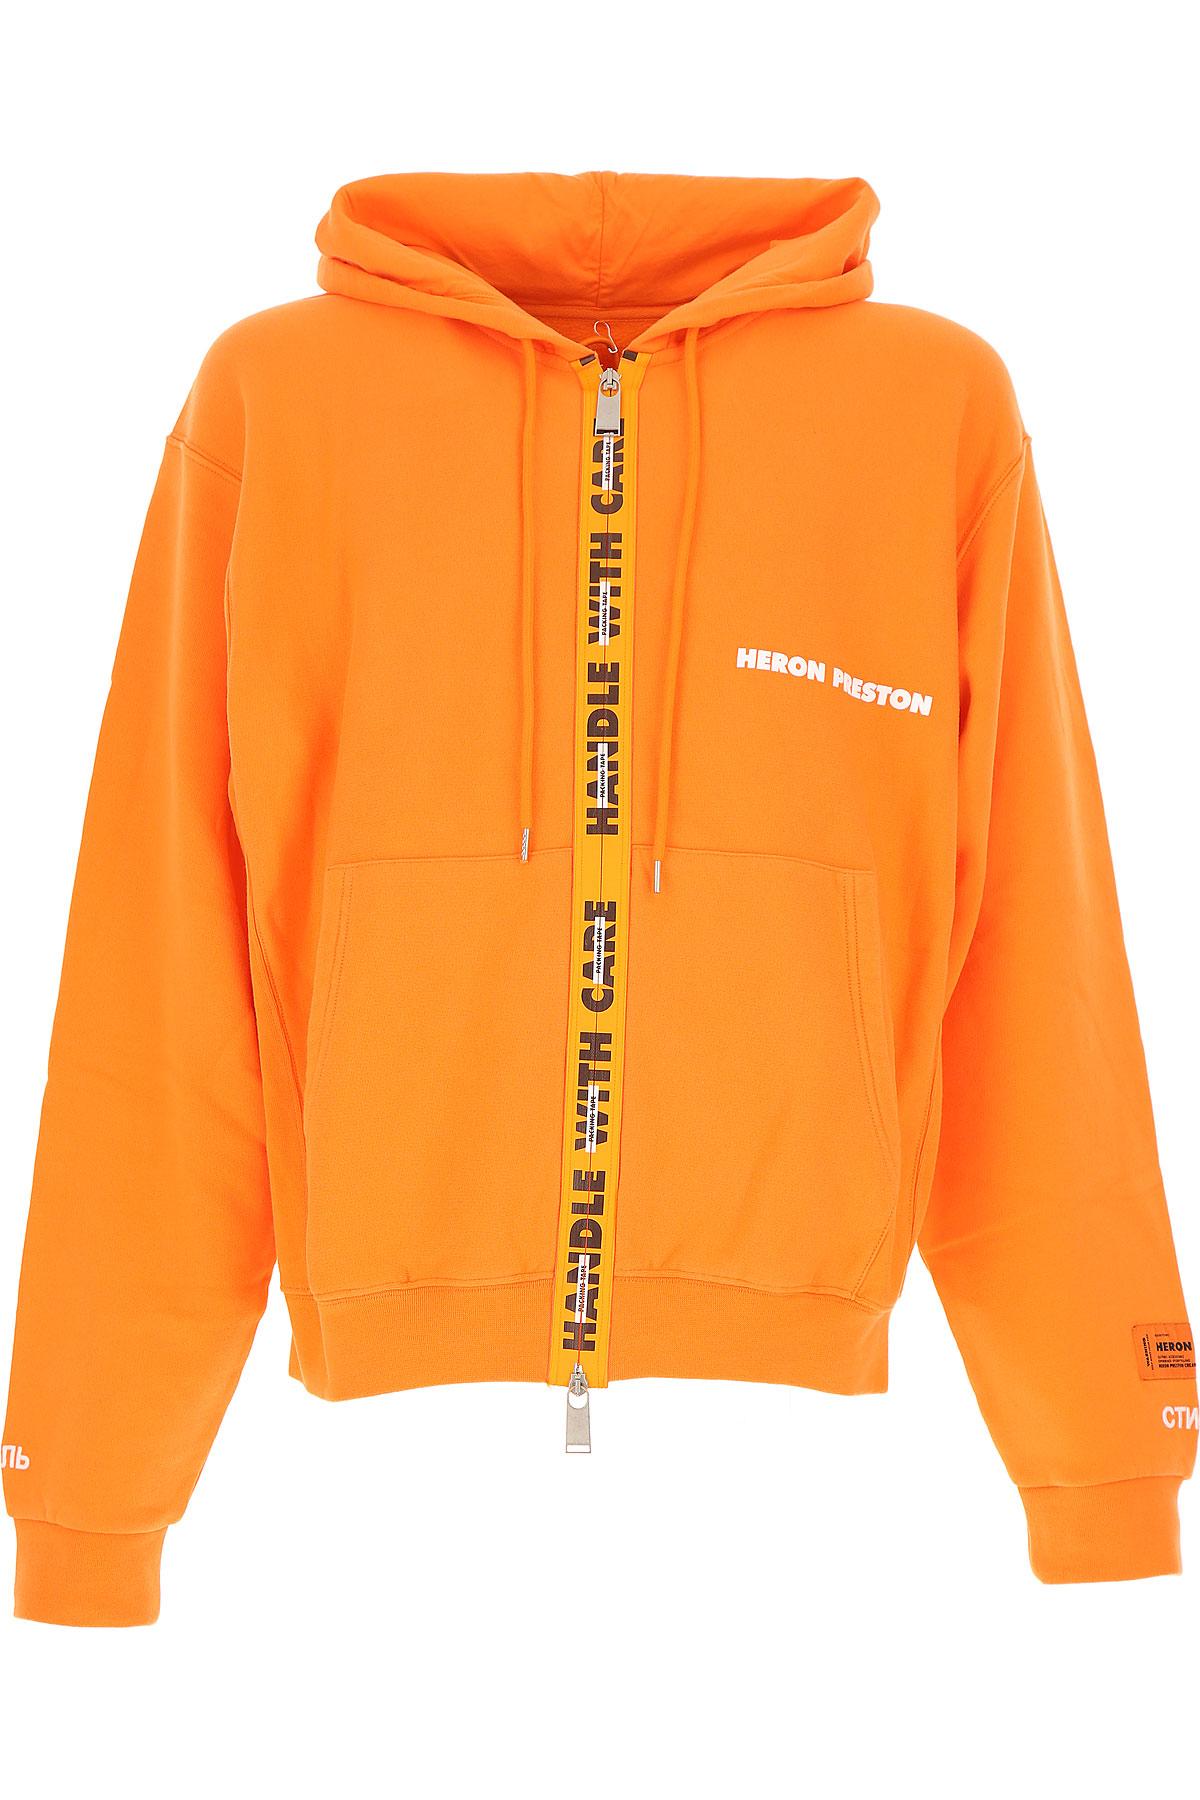 Image of Heron Preston Sweatshirt for Men, neon orange, Cotton, 2017, L M XL